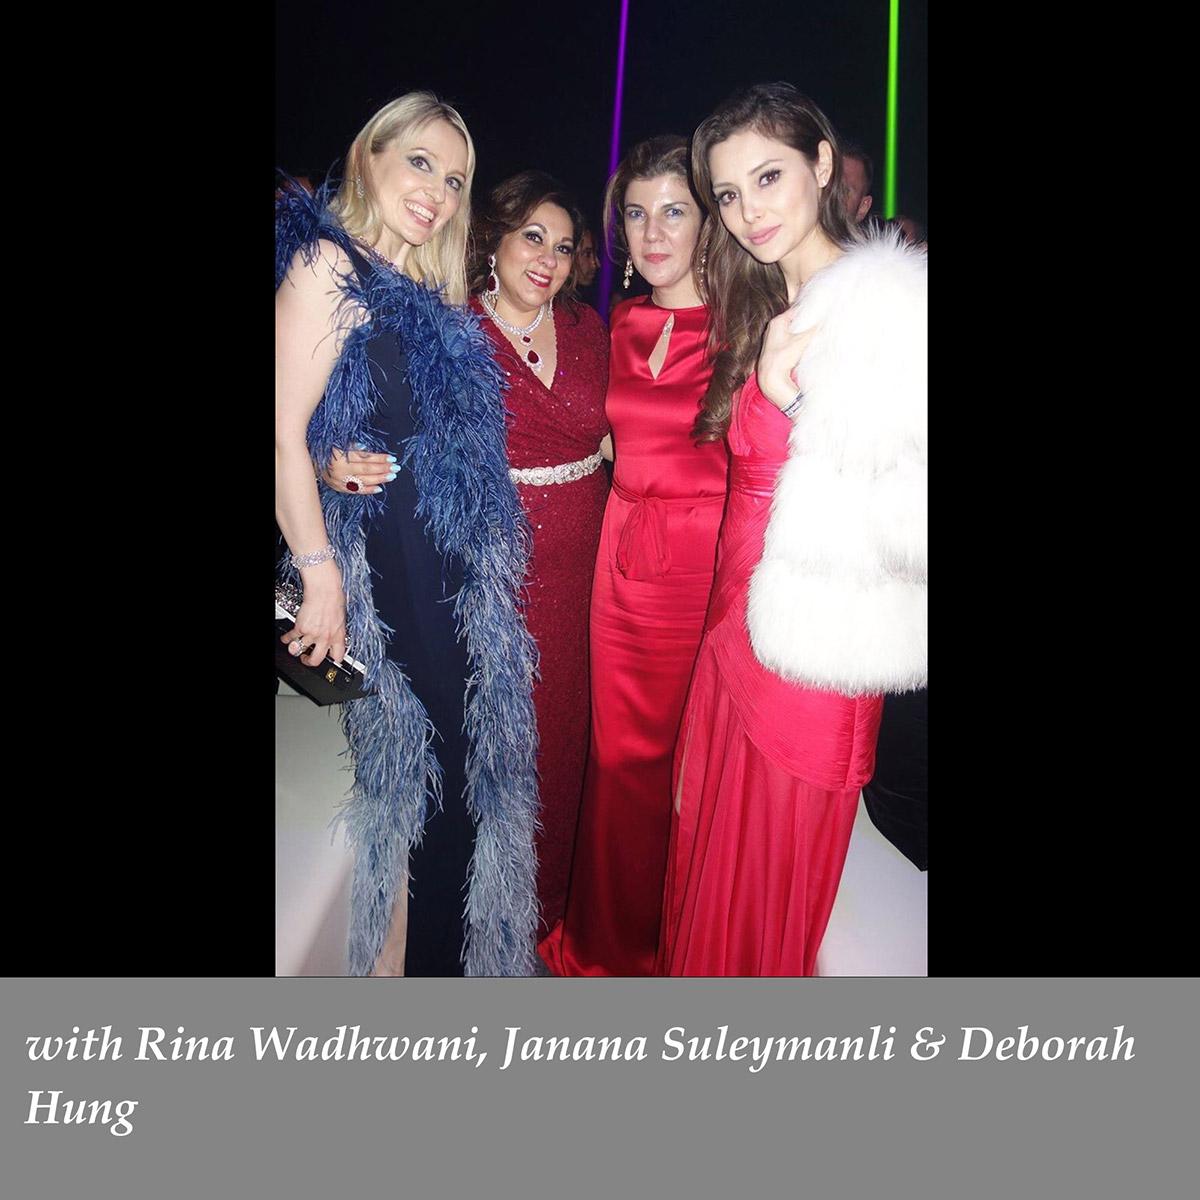 with-Rina-Wadhwani,-Janana-Suleymanli-&-Deborah-Hung